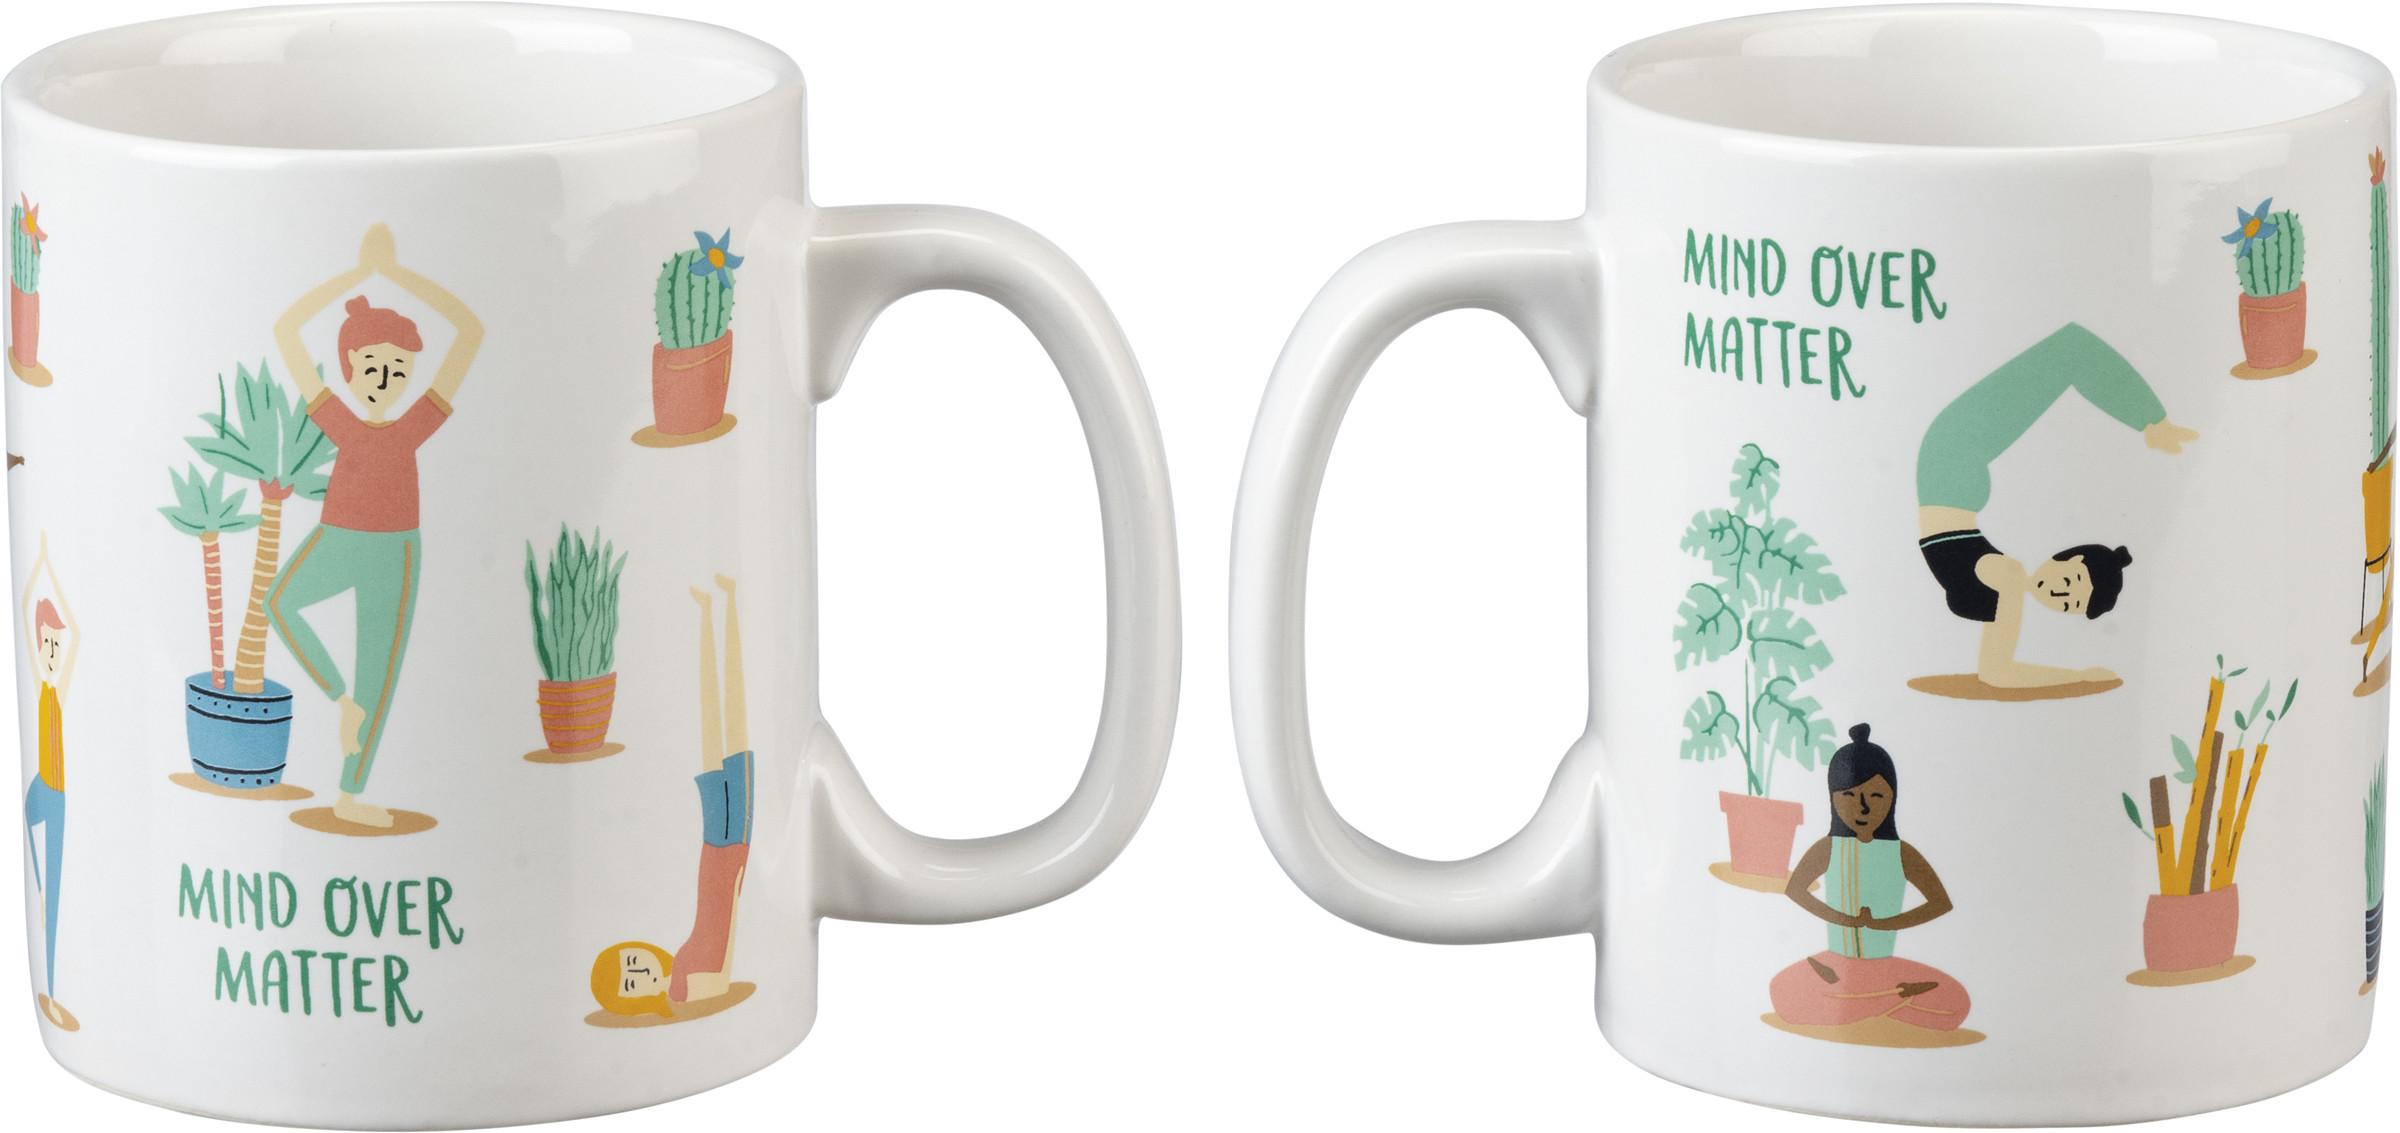 Mug Mind Over Matter Lol Made You Smile Collection Primitives By Kathy